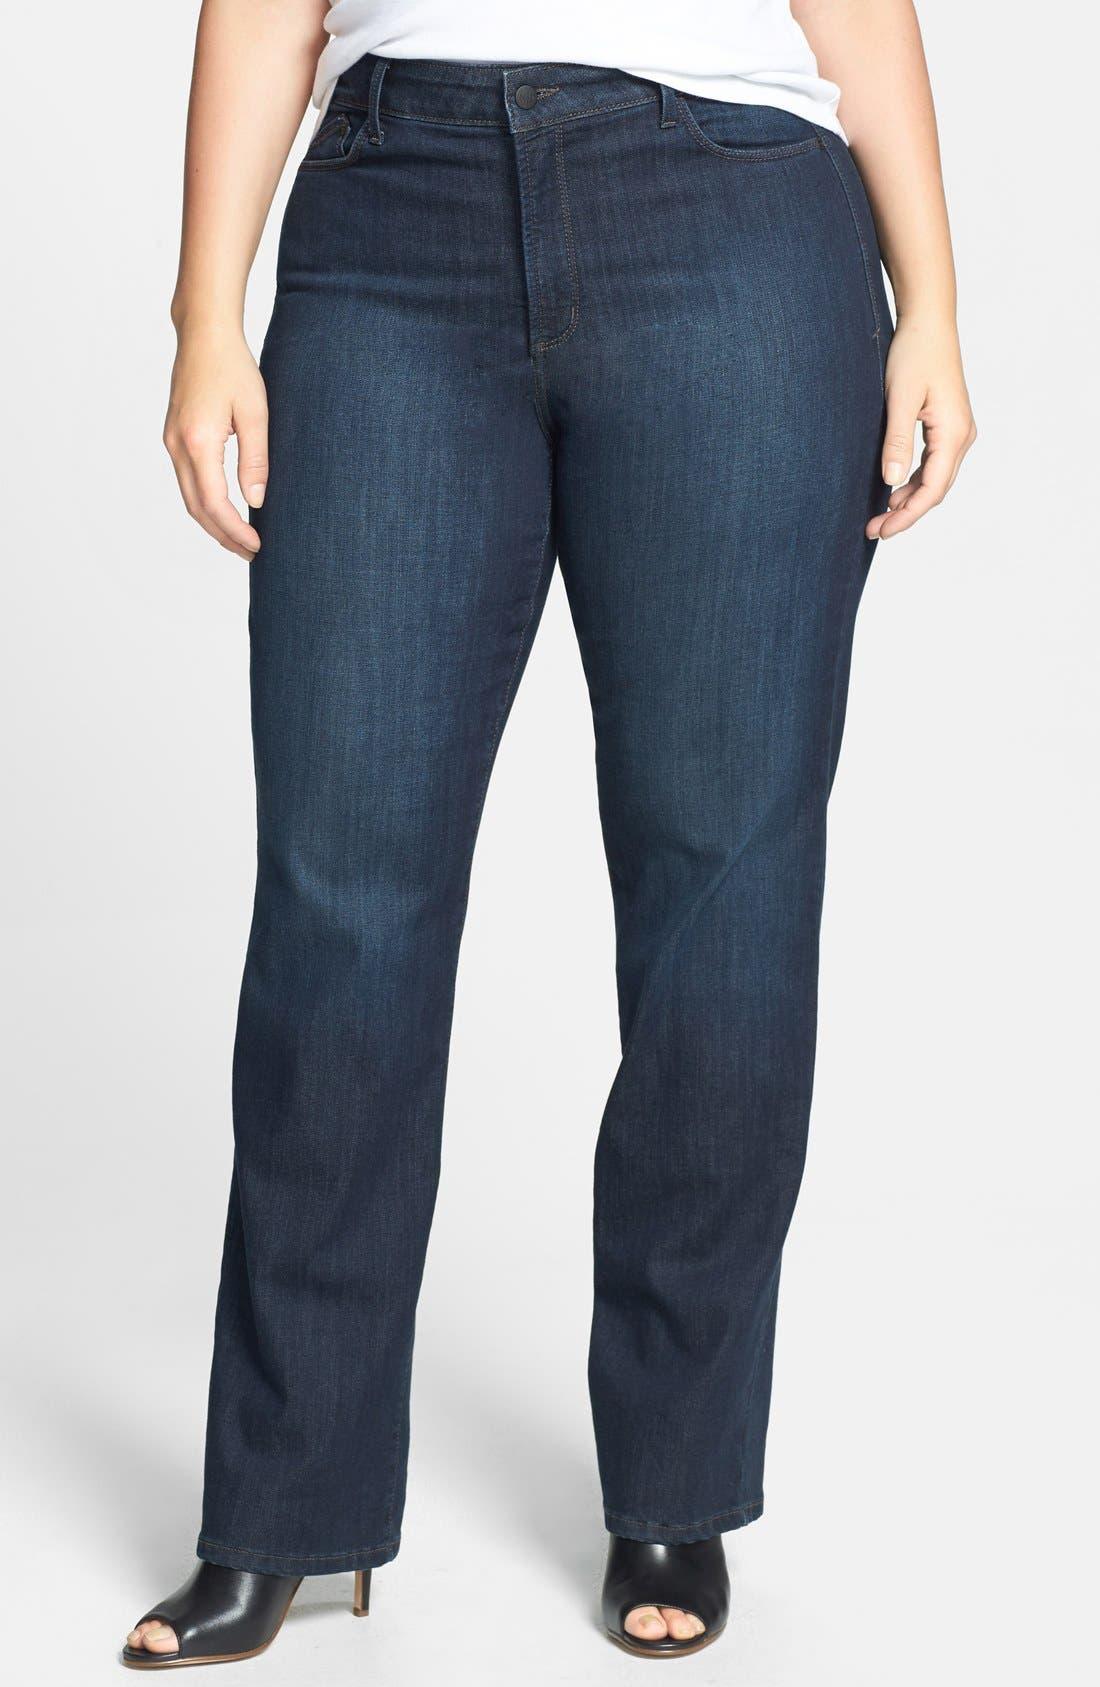 Main Image - NYDJ 'Marilyn' Stretch Straight Leg Jeans (Harrington) (Plus Size)